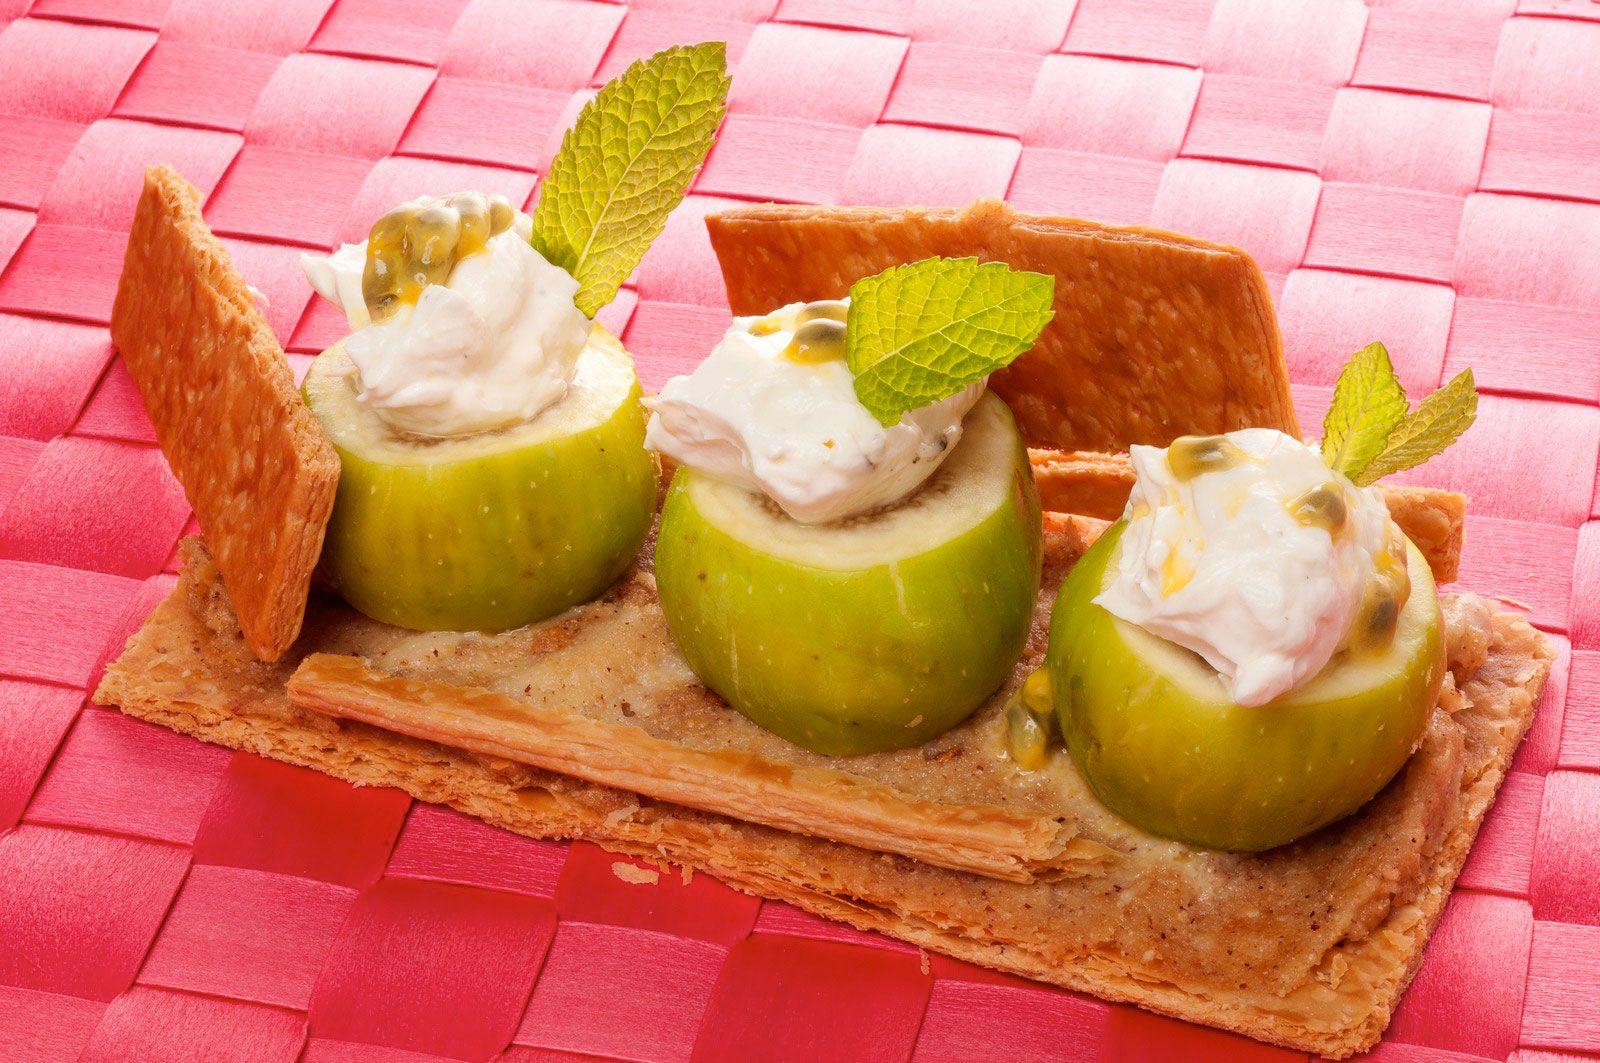 Receta de tarta de higos con queso apasionado